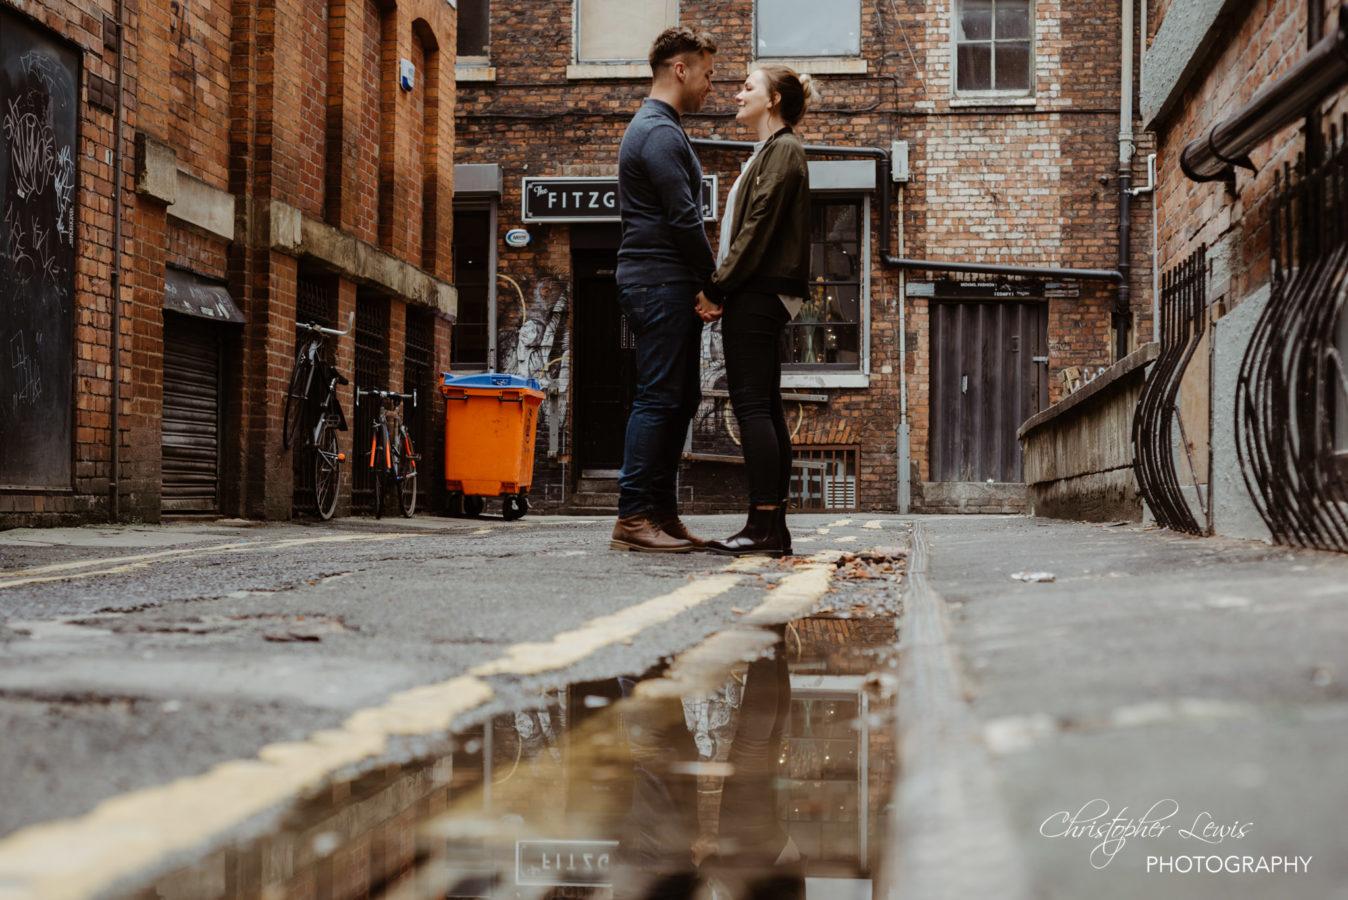 Northern-Quarter-Manchester-Pre-Wedding-Photoshoot-5